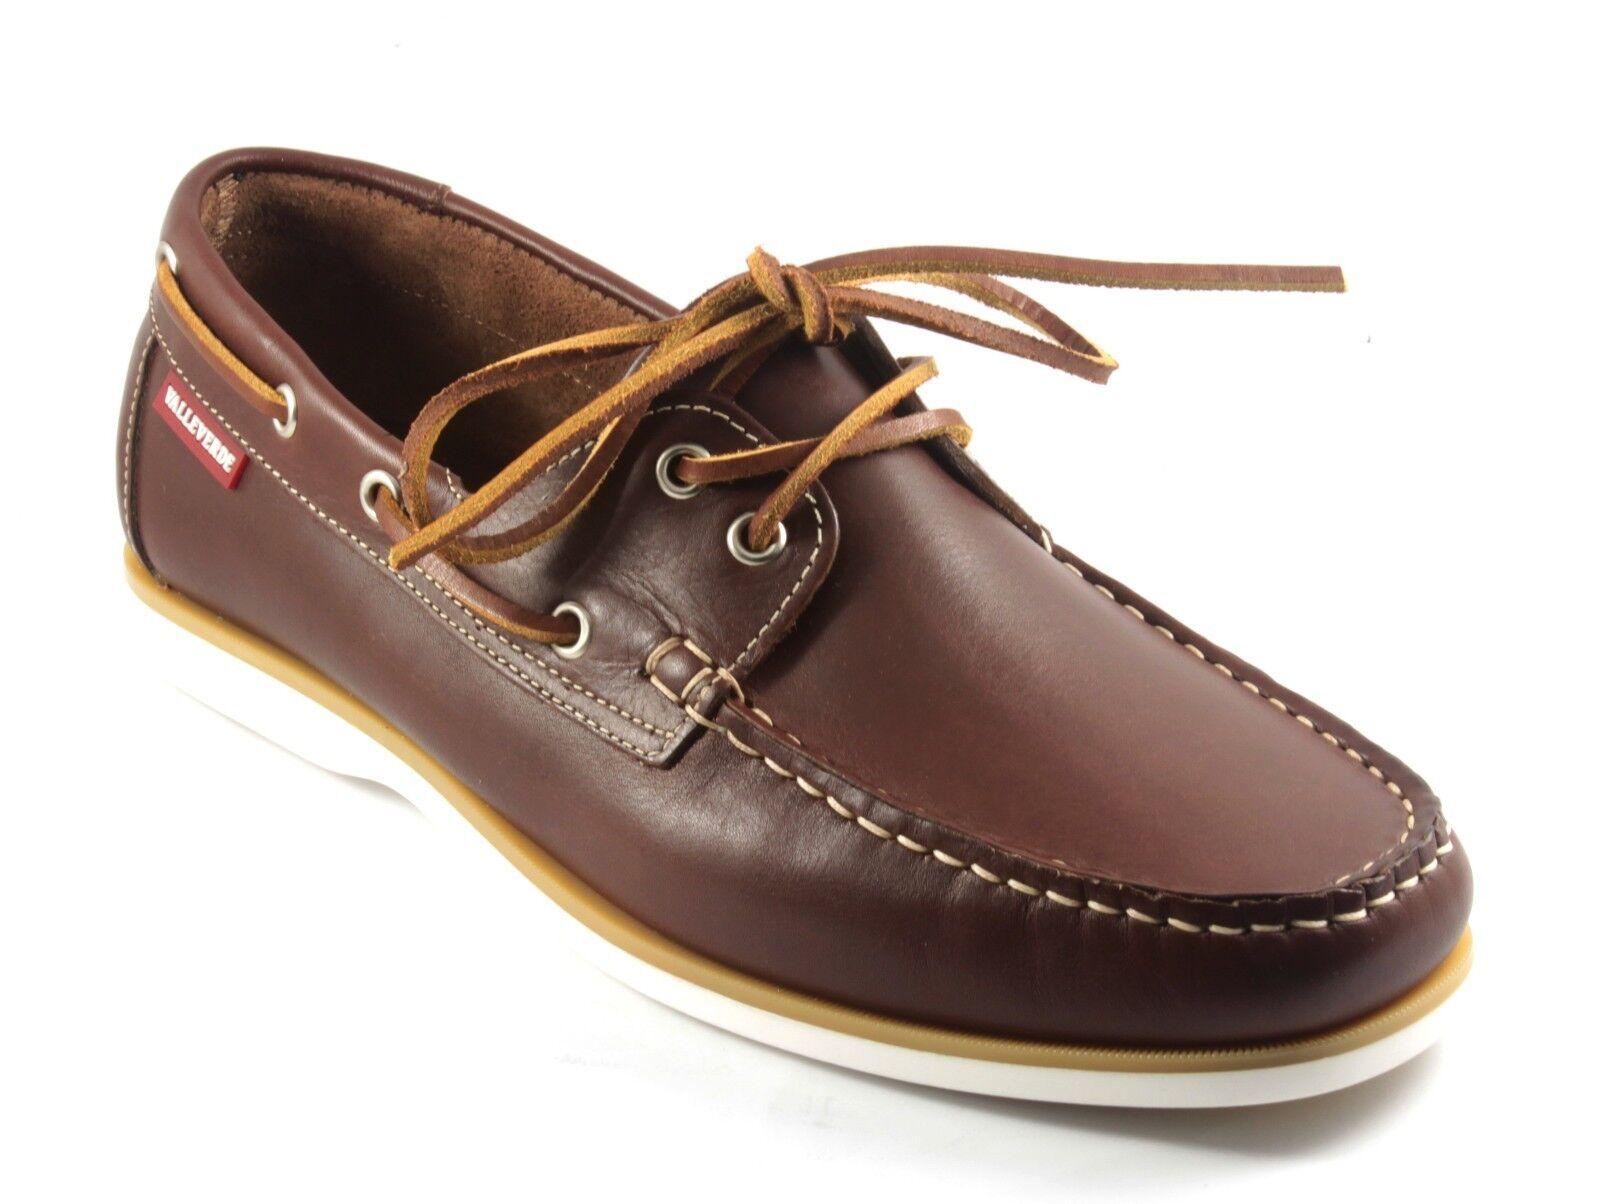 11802 VALLEverde zapatos hombres ALLACCIATE DA BARCA IN PELLE ColorE marrón n. 45